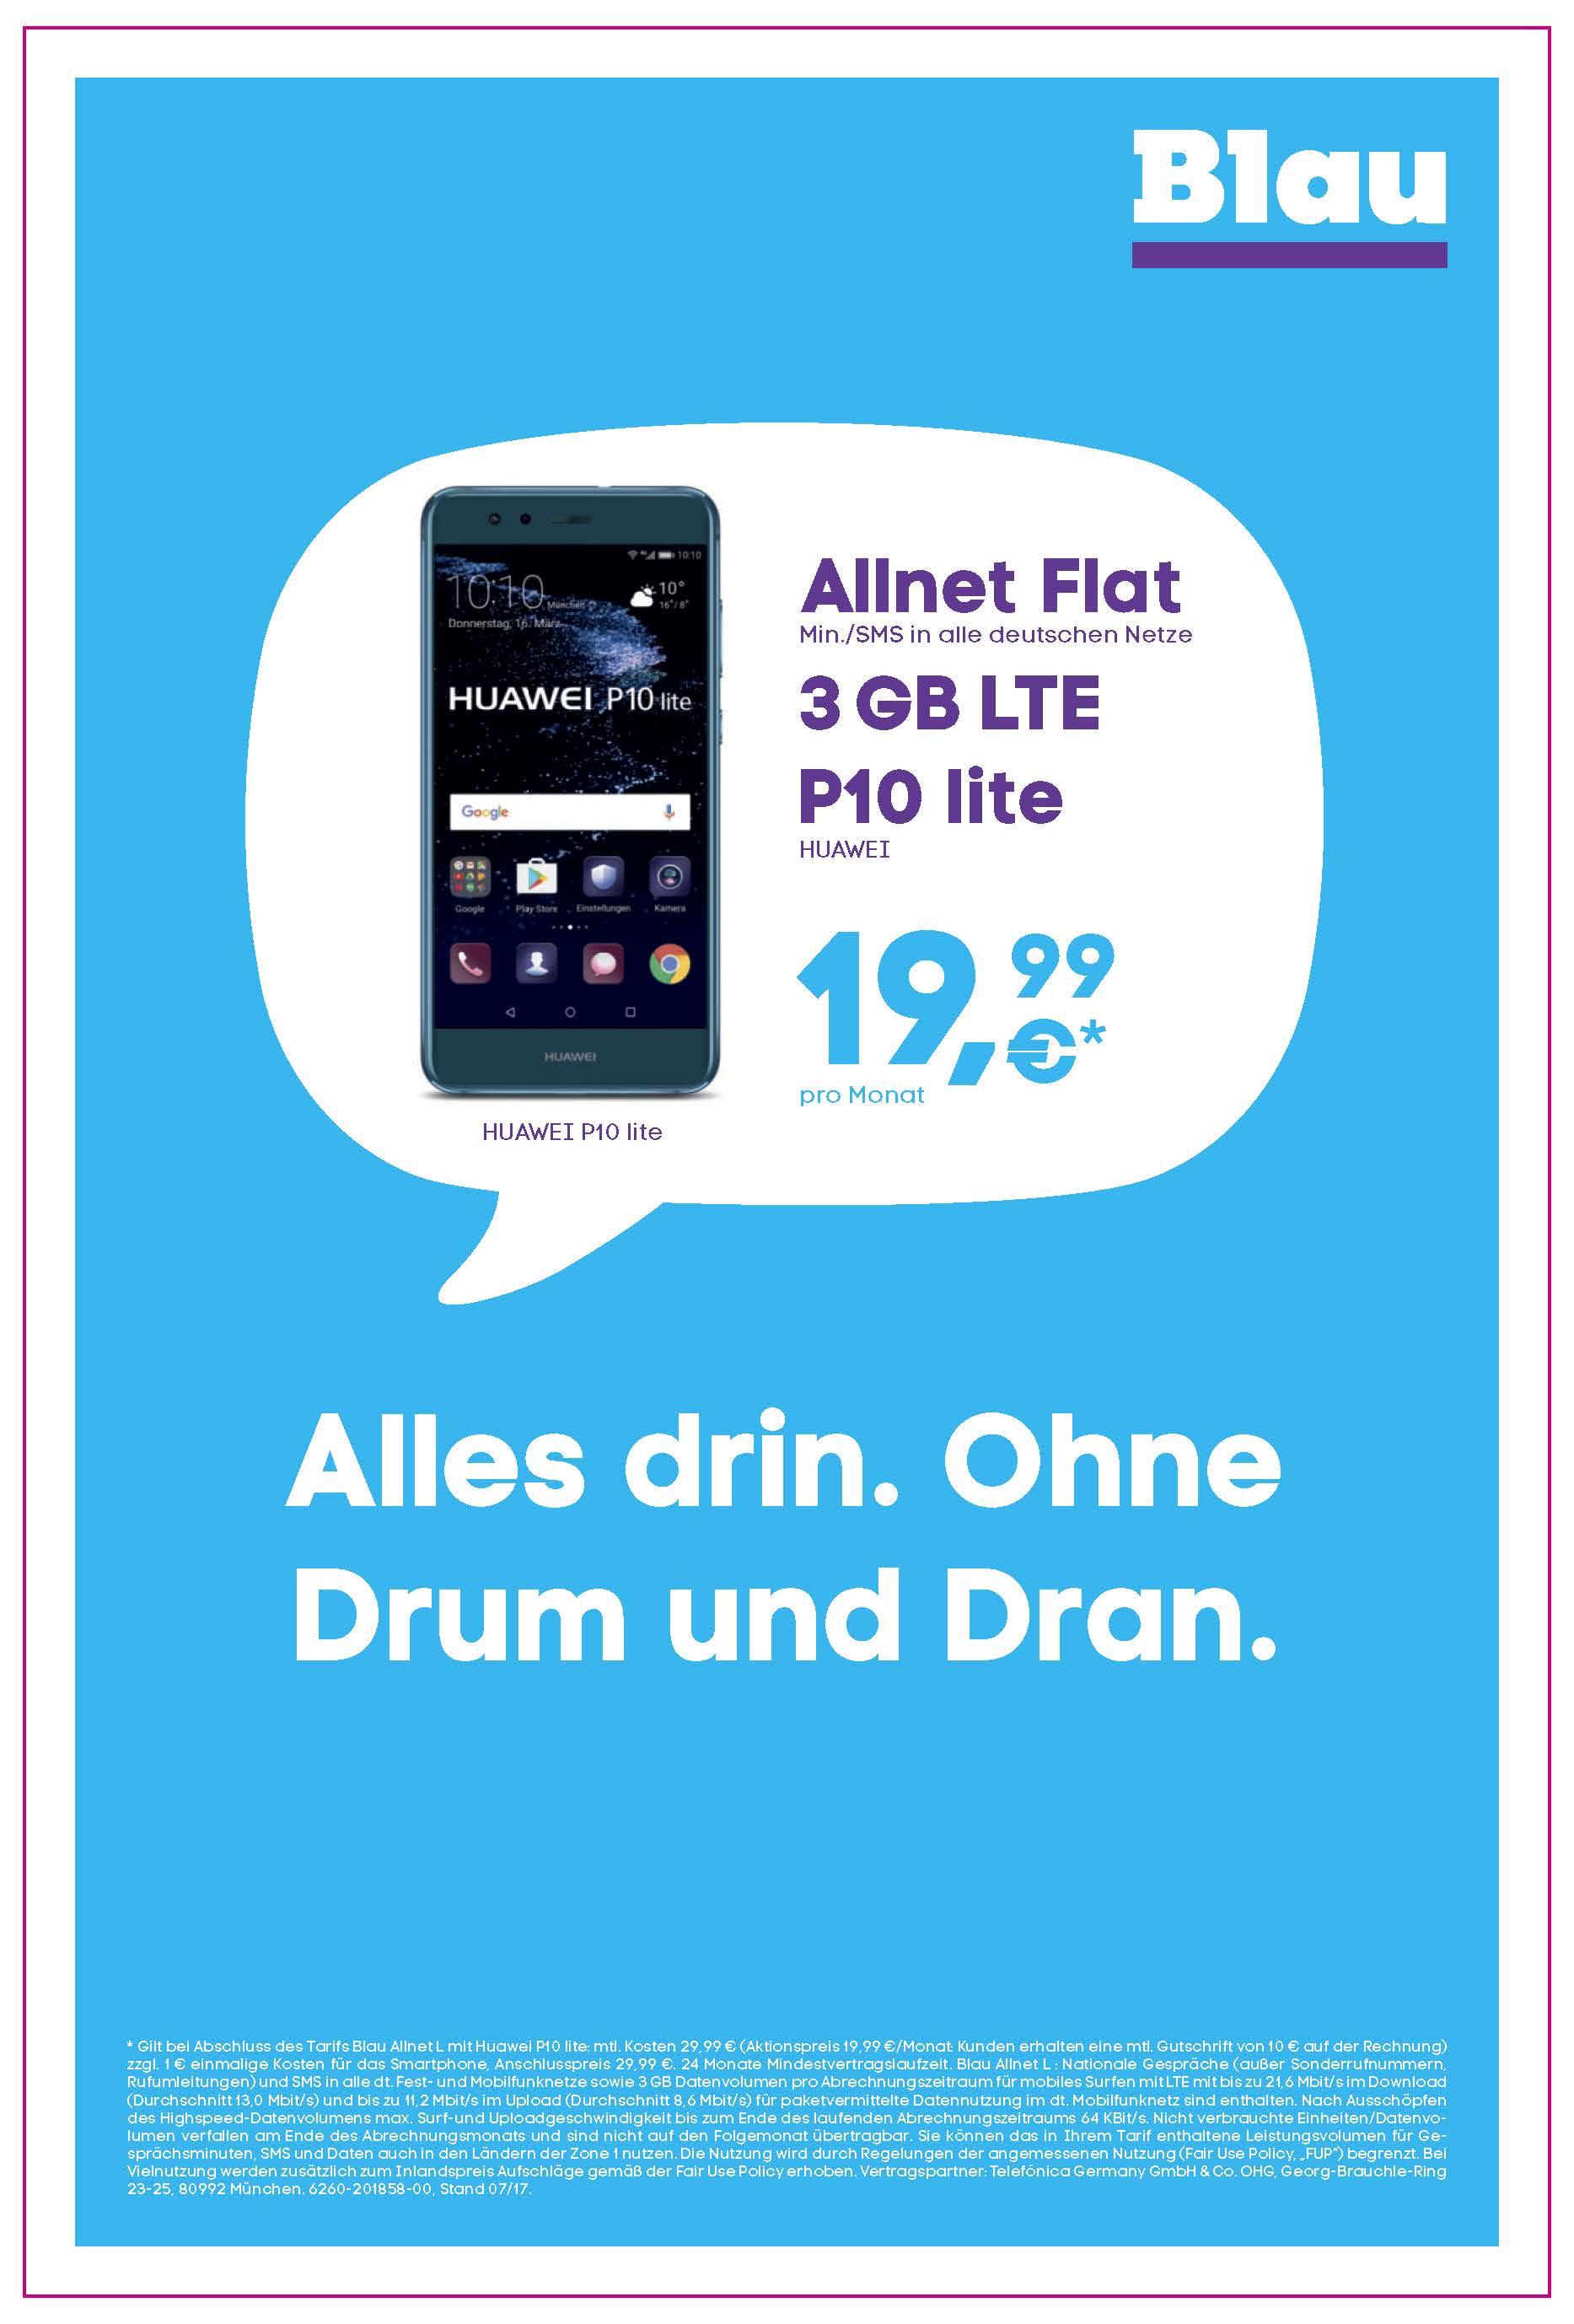 BLAU_OoH_Allnetflat_Huawei_P10_lite_CLP_M1730001_F39_150dpi_netto[1]_Seite_1.jpg